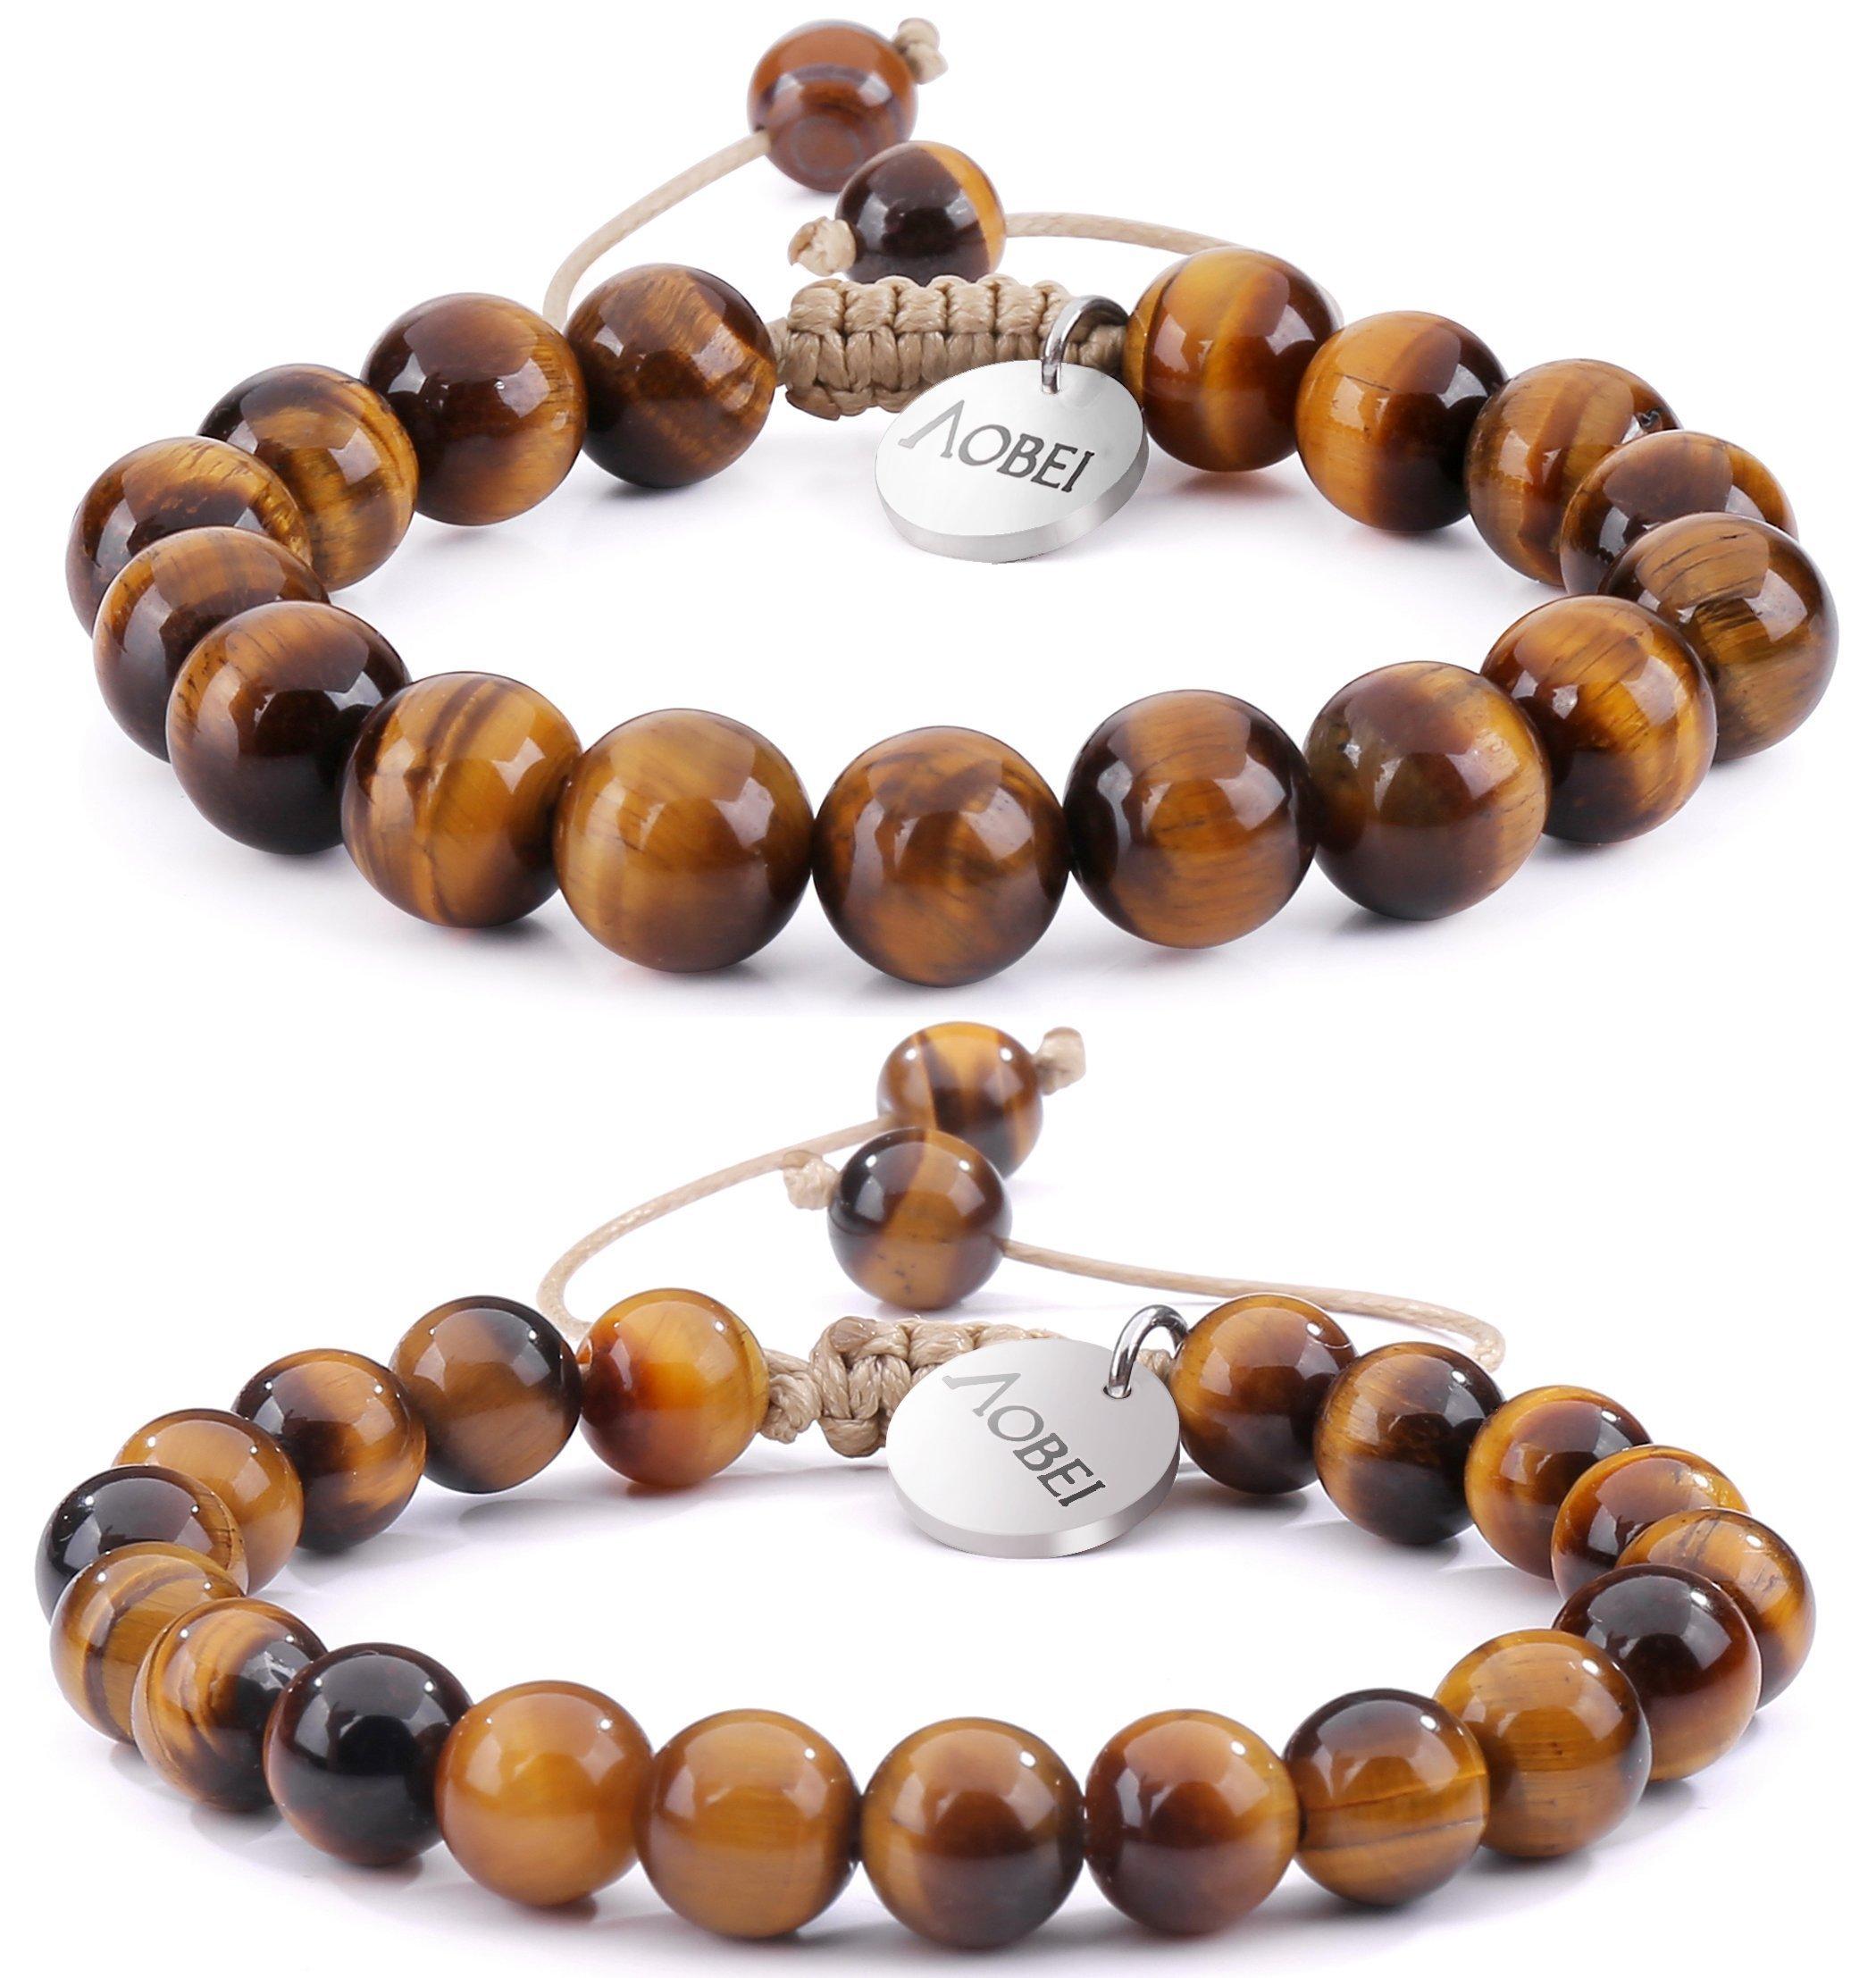 2PCS Tiger Eye Gemstone Beaded Couple Bracelet 8MM/10MM Round Beads Healing Reiki Macrame Adjustable Jewelry for Men Women by Aobei